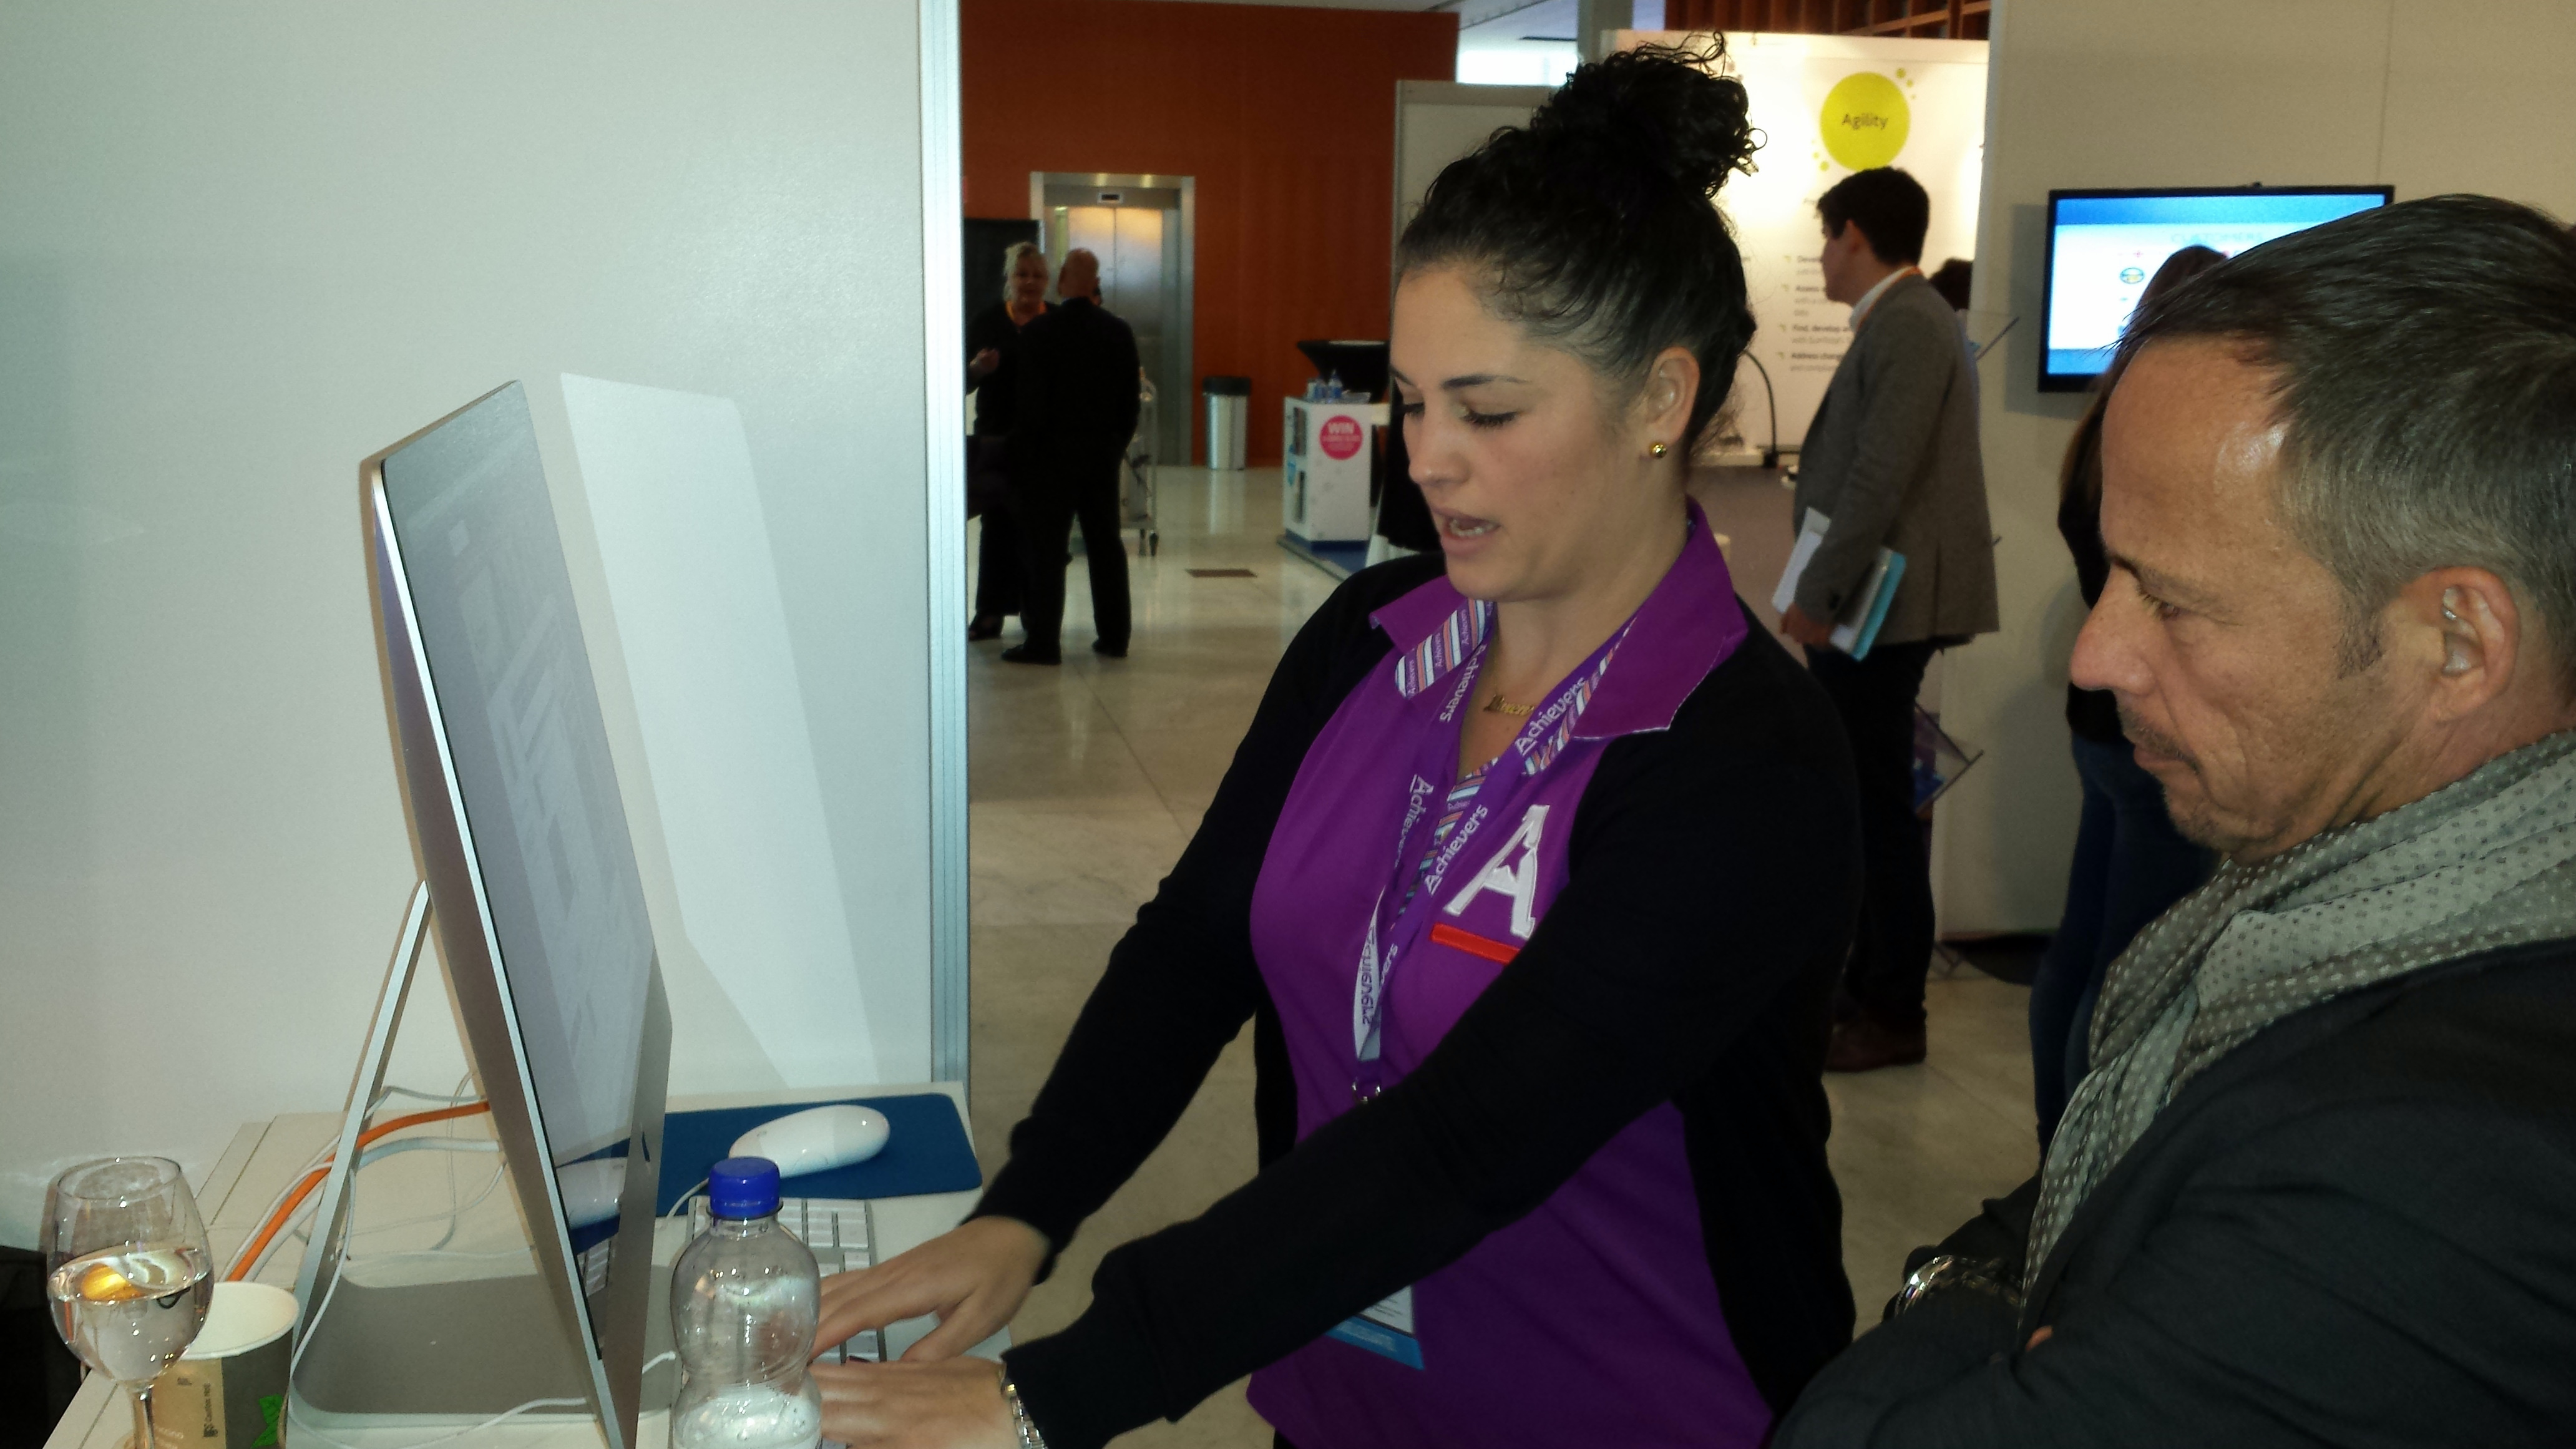 Loren-Maisels-@-Achievers-booth-demo-@-HR-Tech-Europe-2014